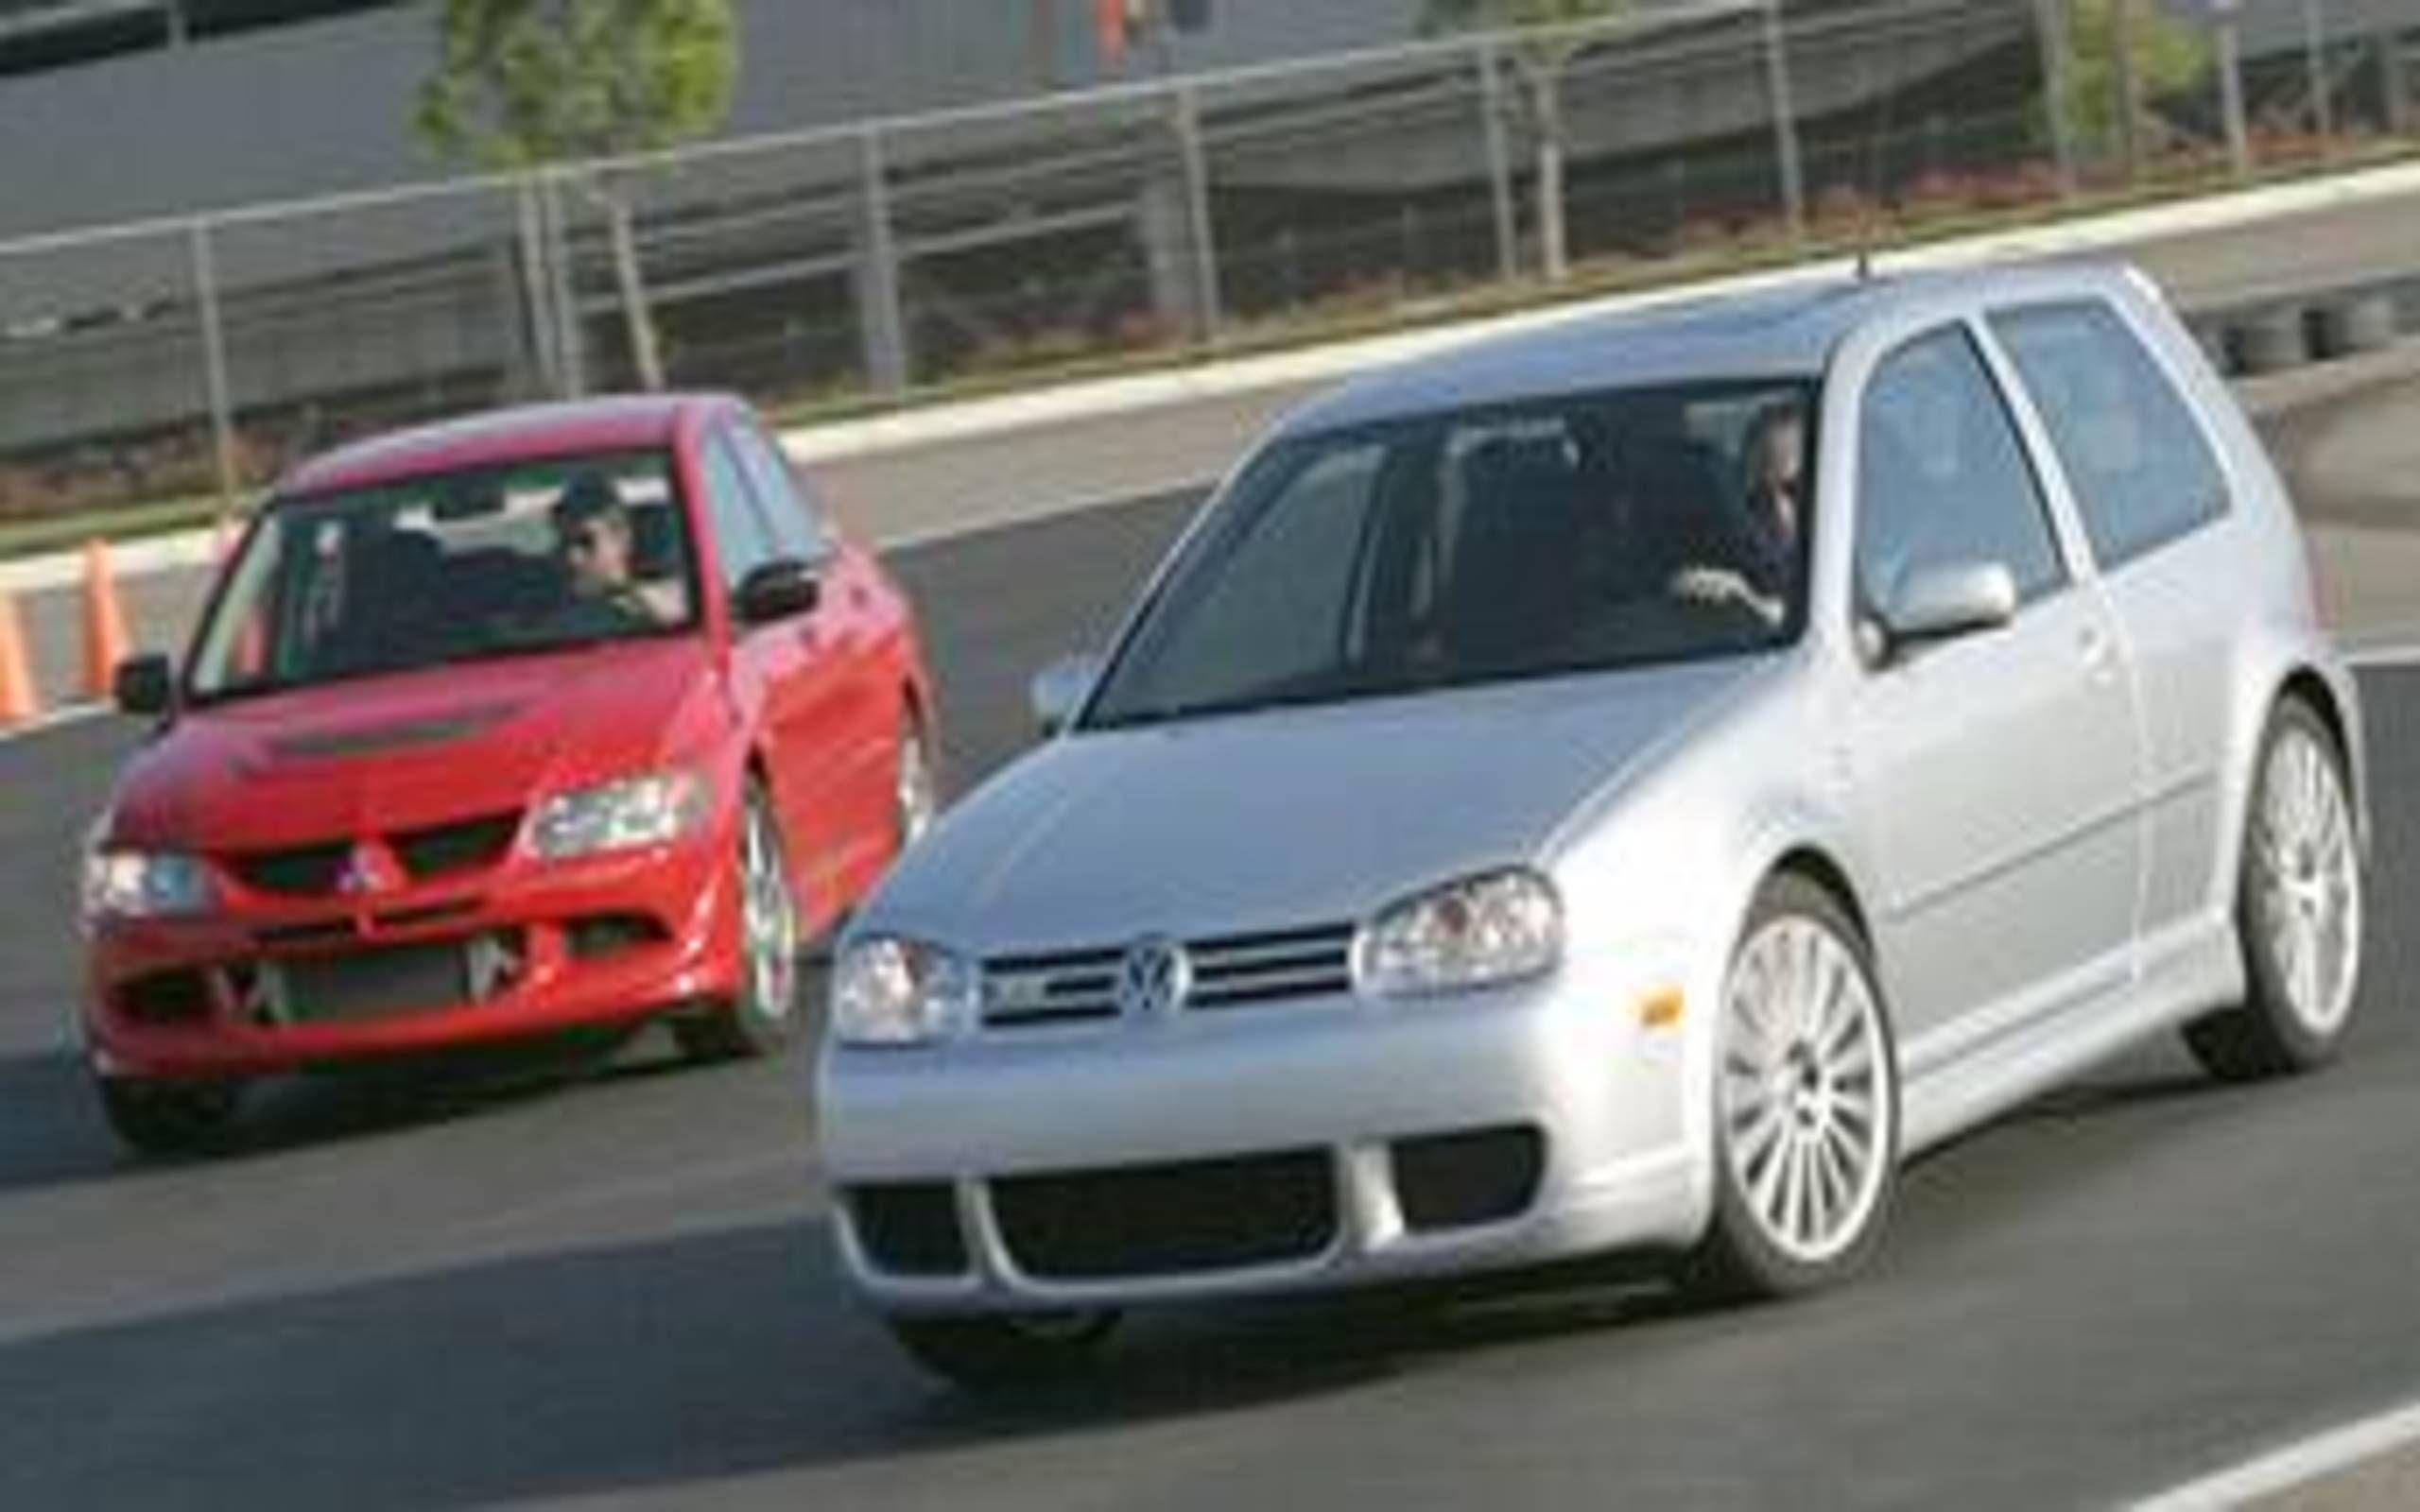 2004 mitsubishi evolution rs vs 2004 volkswagen golf r32 japan vs germany succeeds dearborn vs detroit vs 2004 volkswagen golf r32